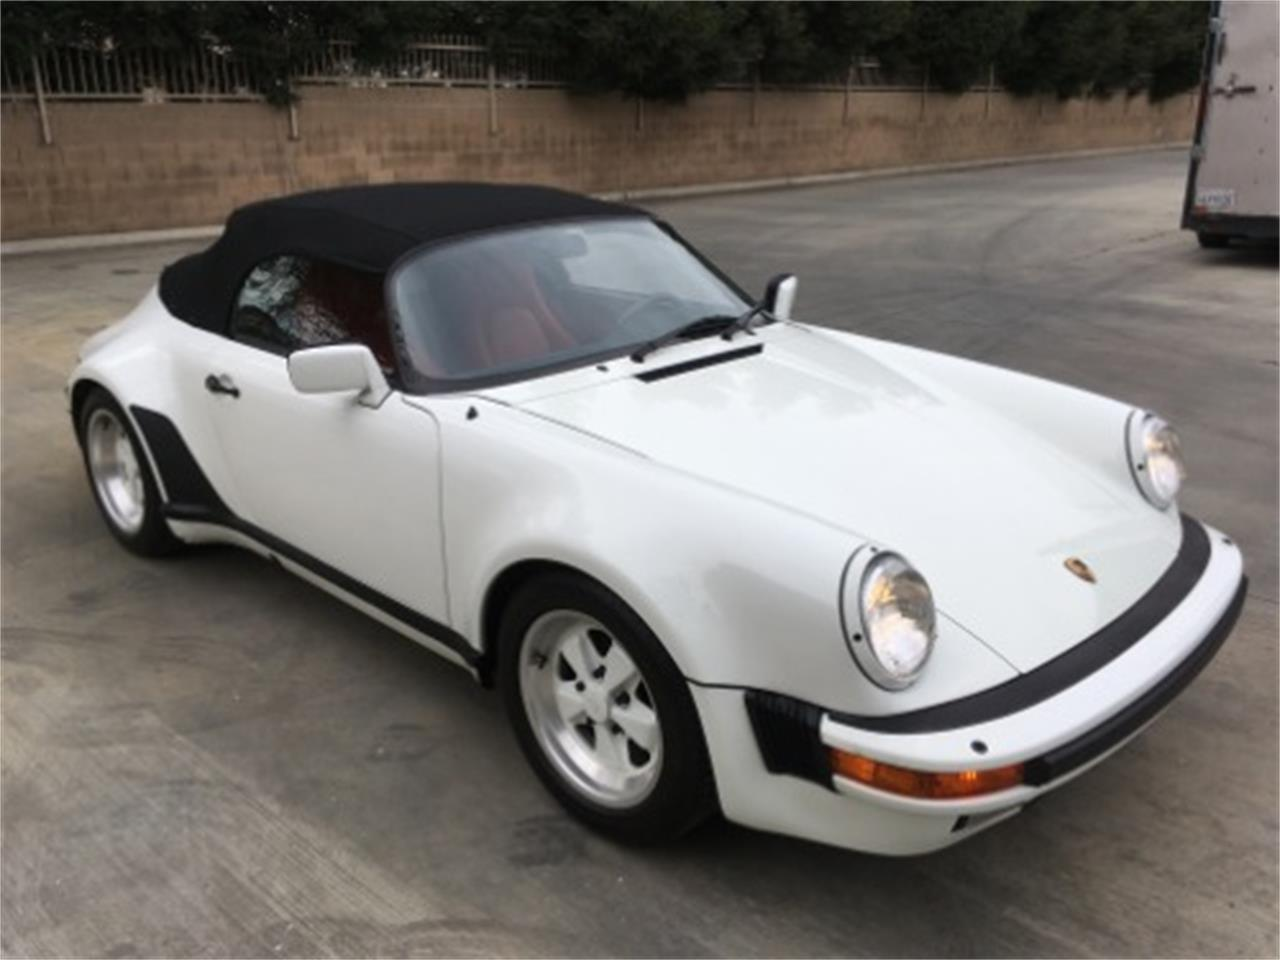 1989 Porsche 911 (CC-1199879) for sale in Astoria, New York